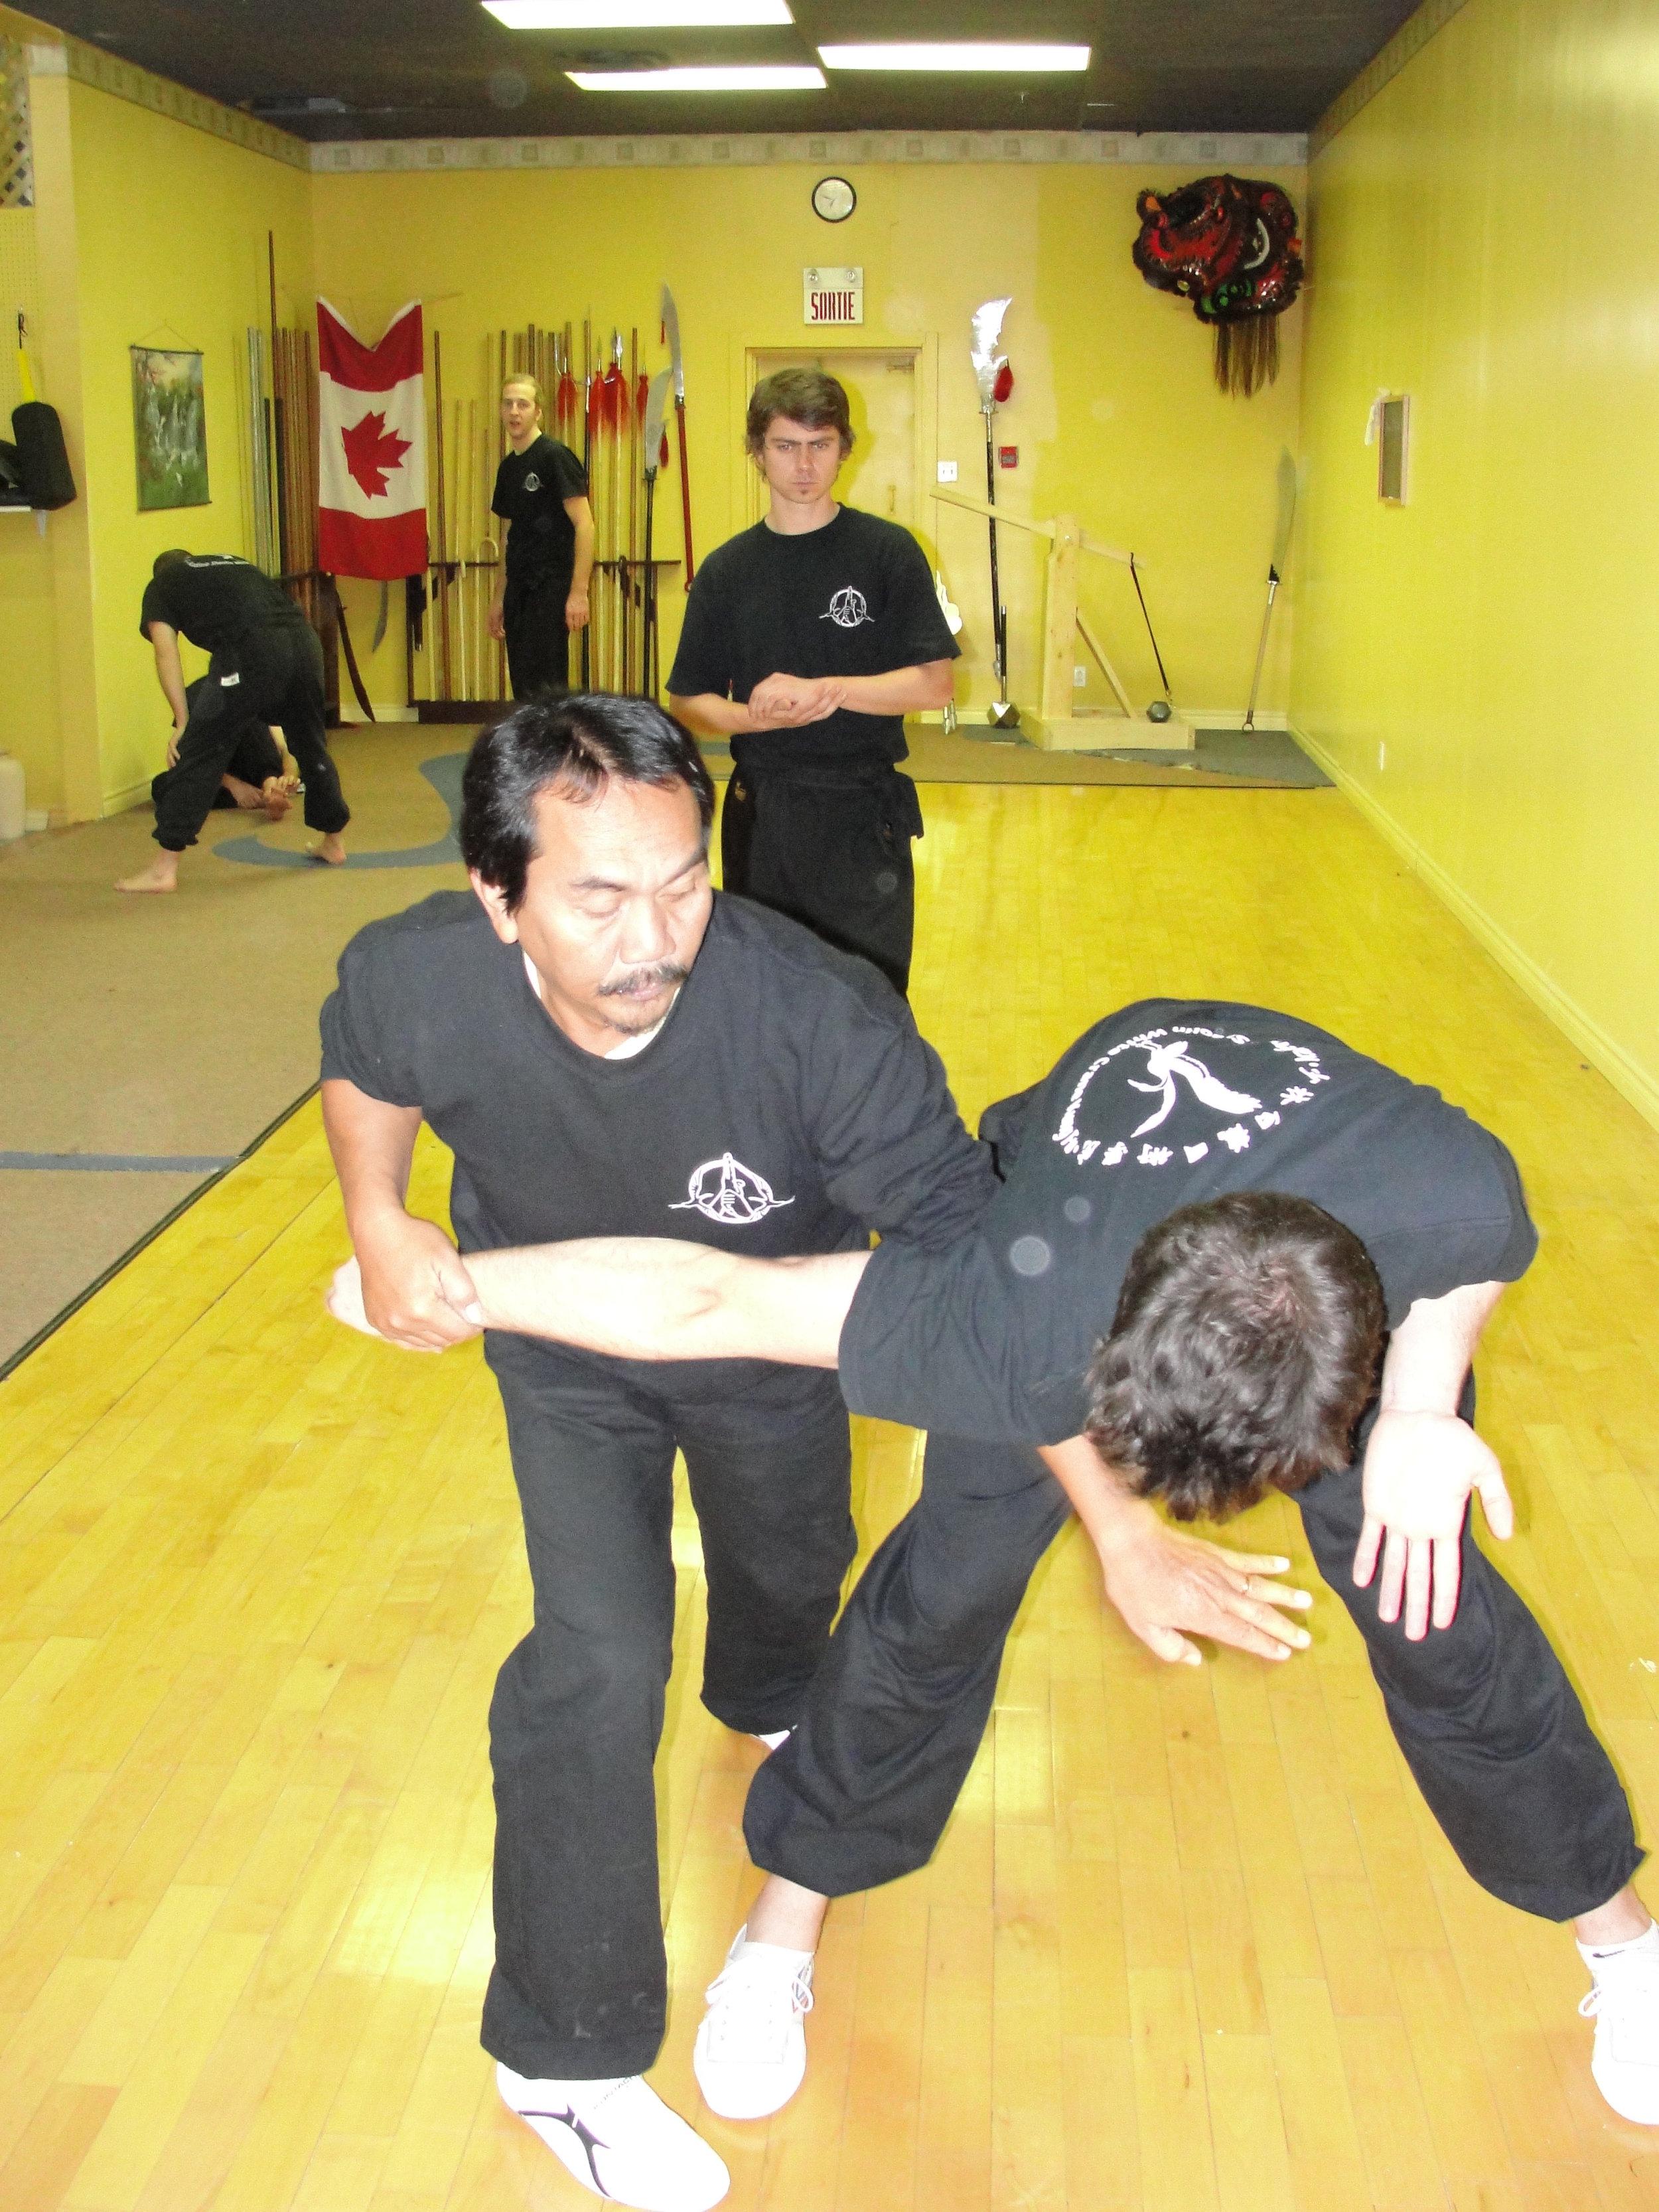 seld-defense-kung-fu-2.JPG